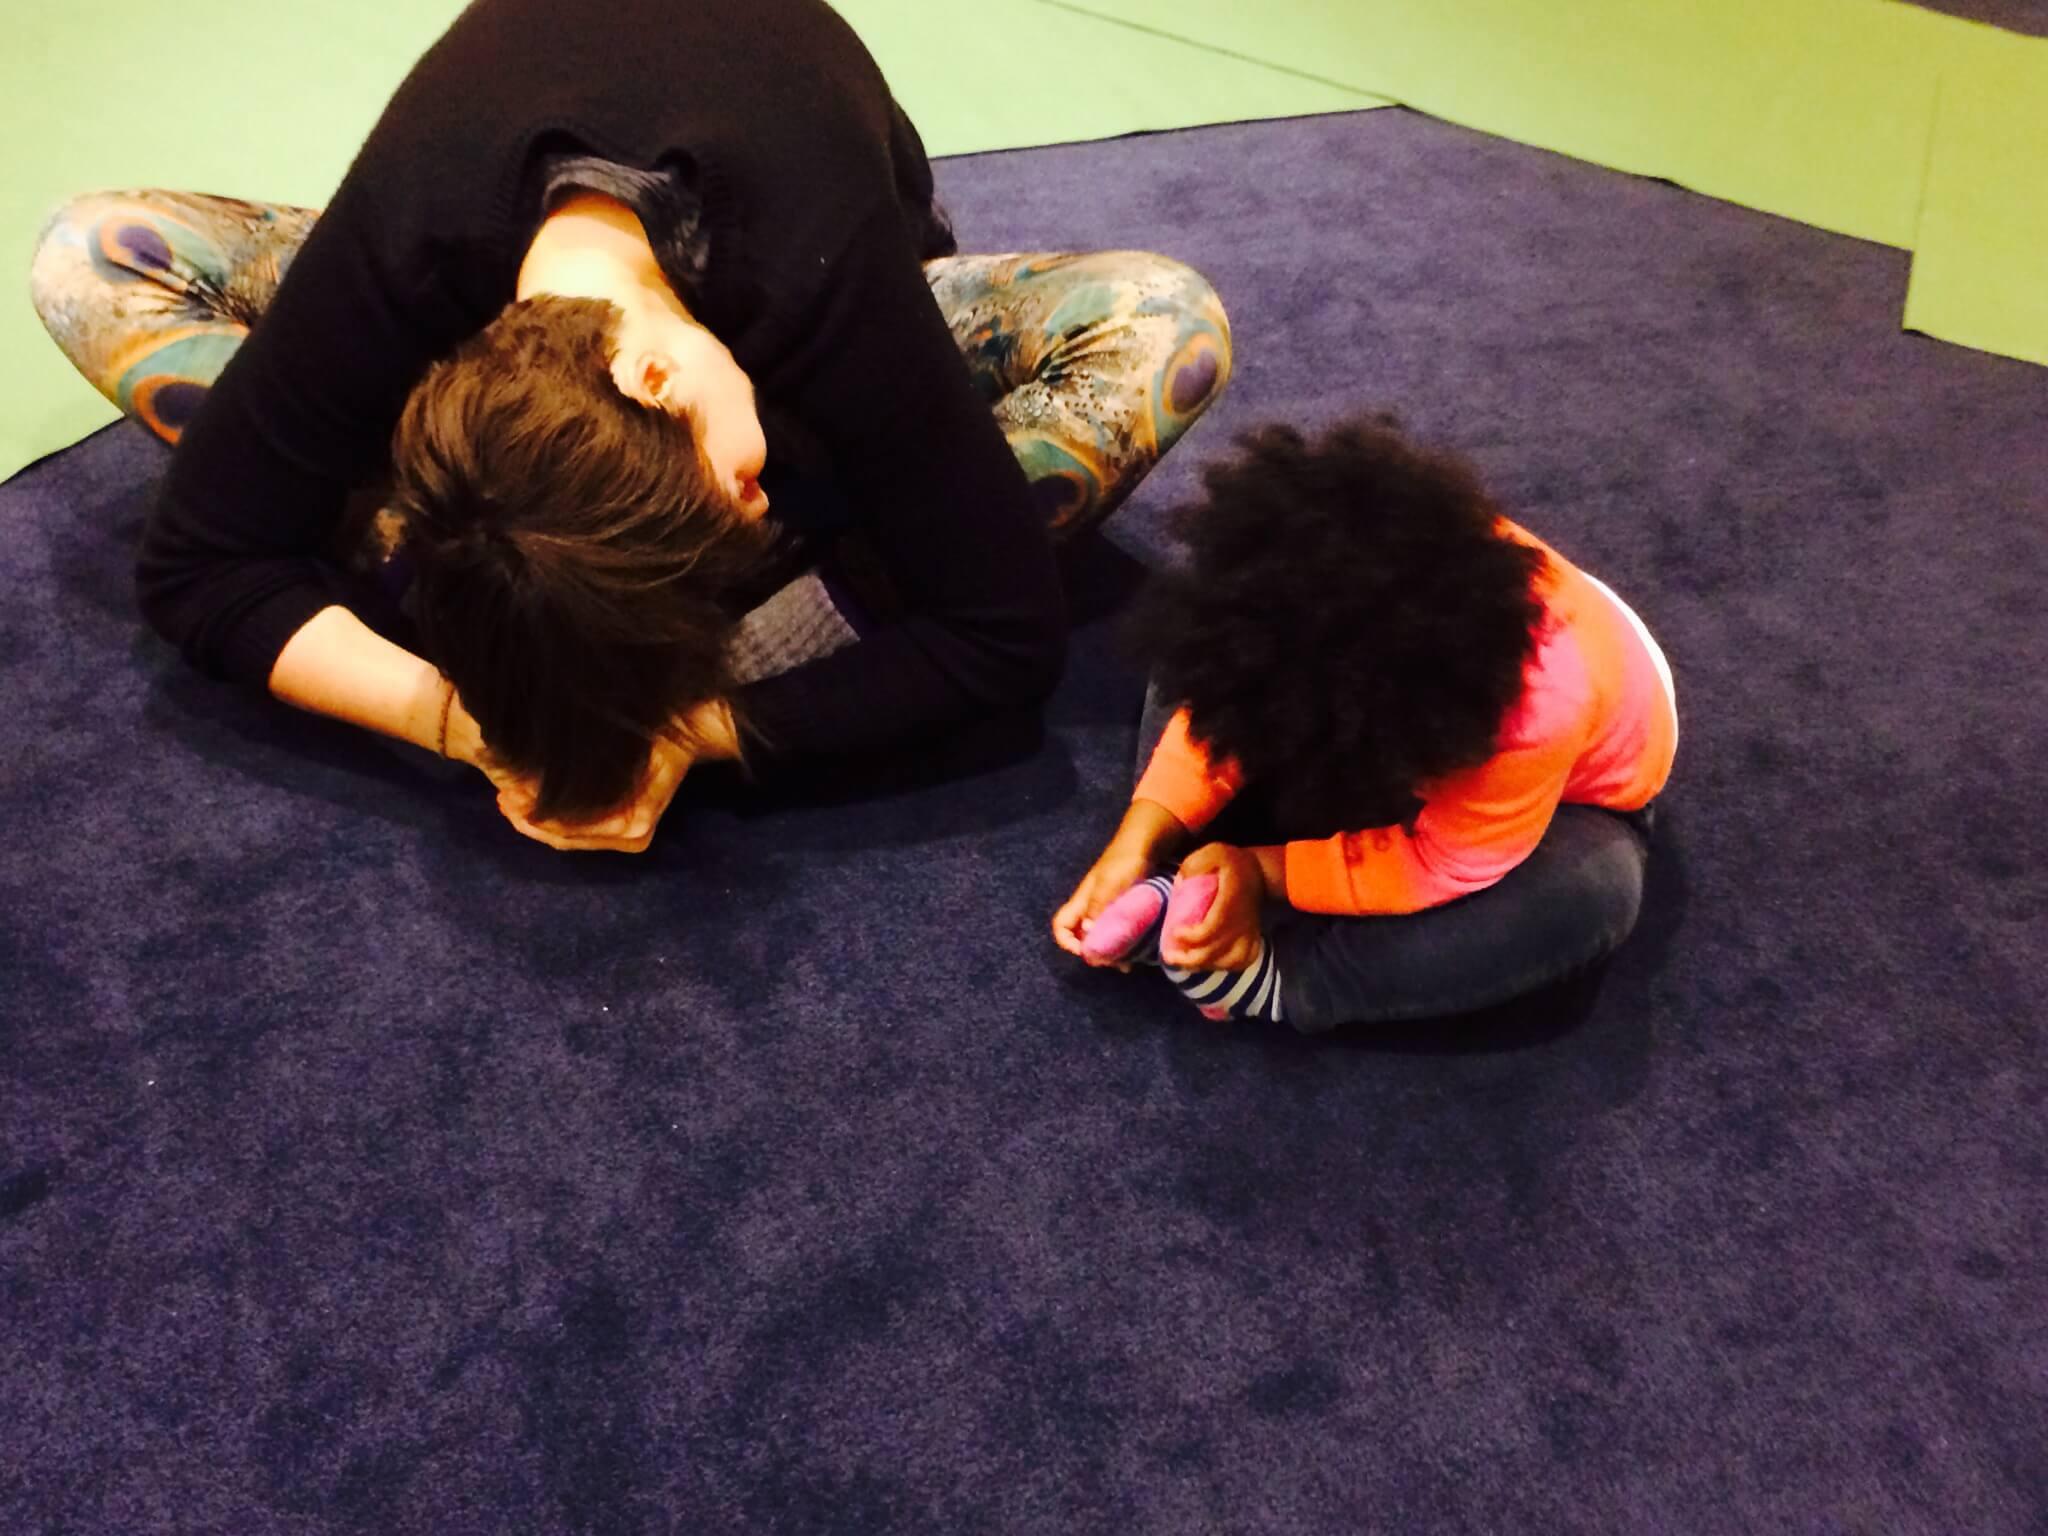 Yoga benefits for kids and teachers - YRM